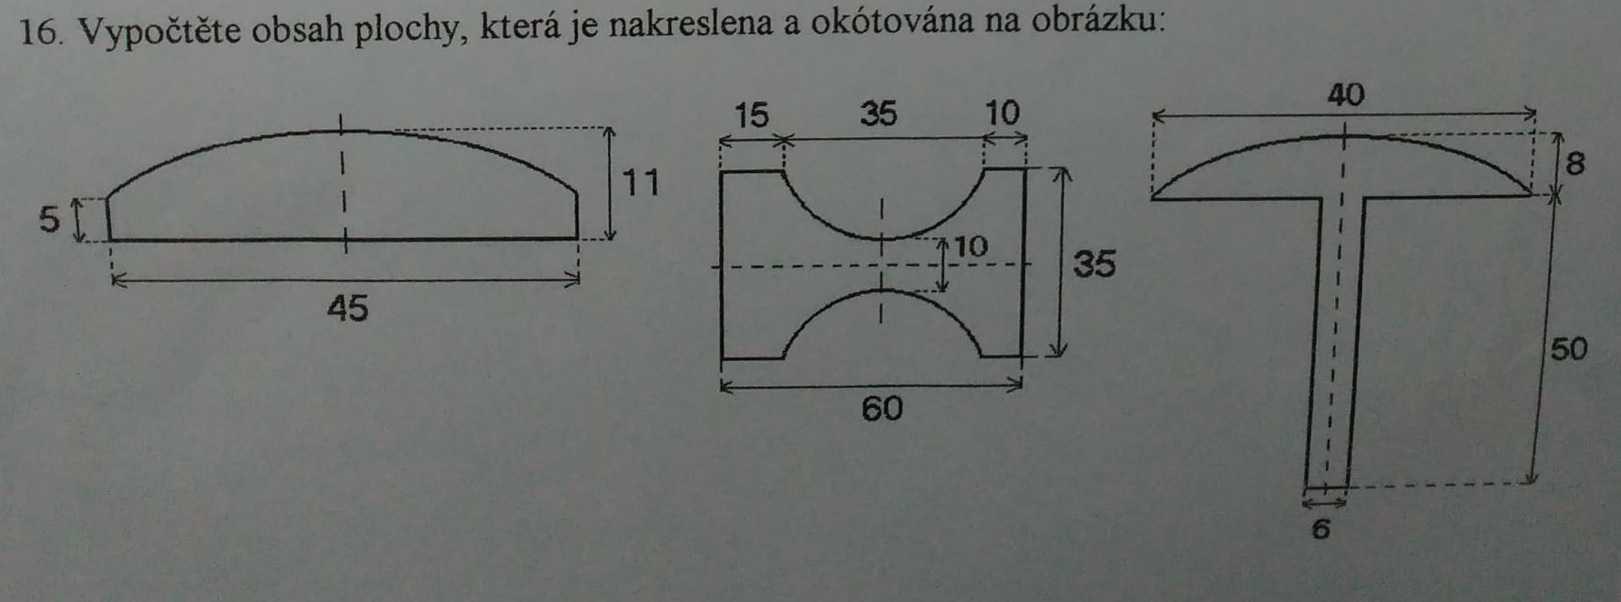 http://forum.matematika.cz/upload3/img/2018-03/62081_Bez%2Bn%25C3%25A1zvu.jpg